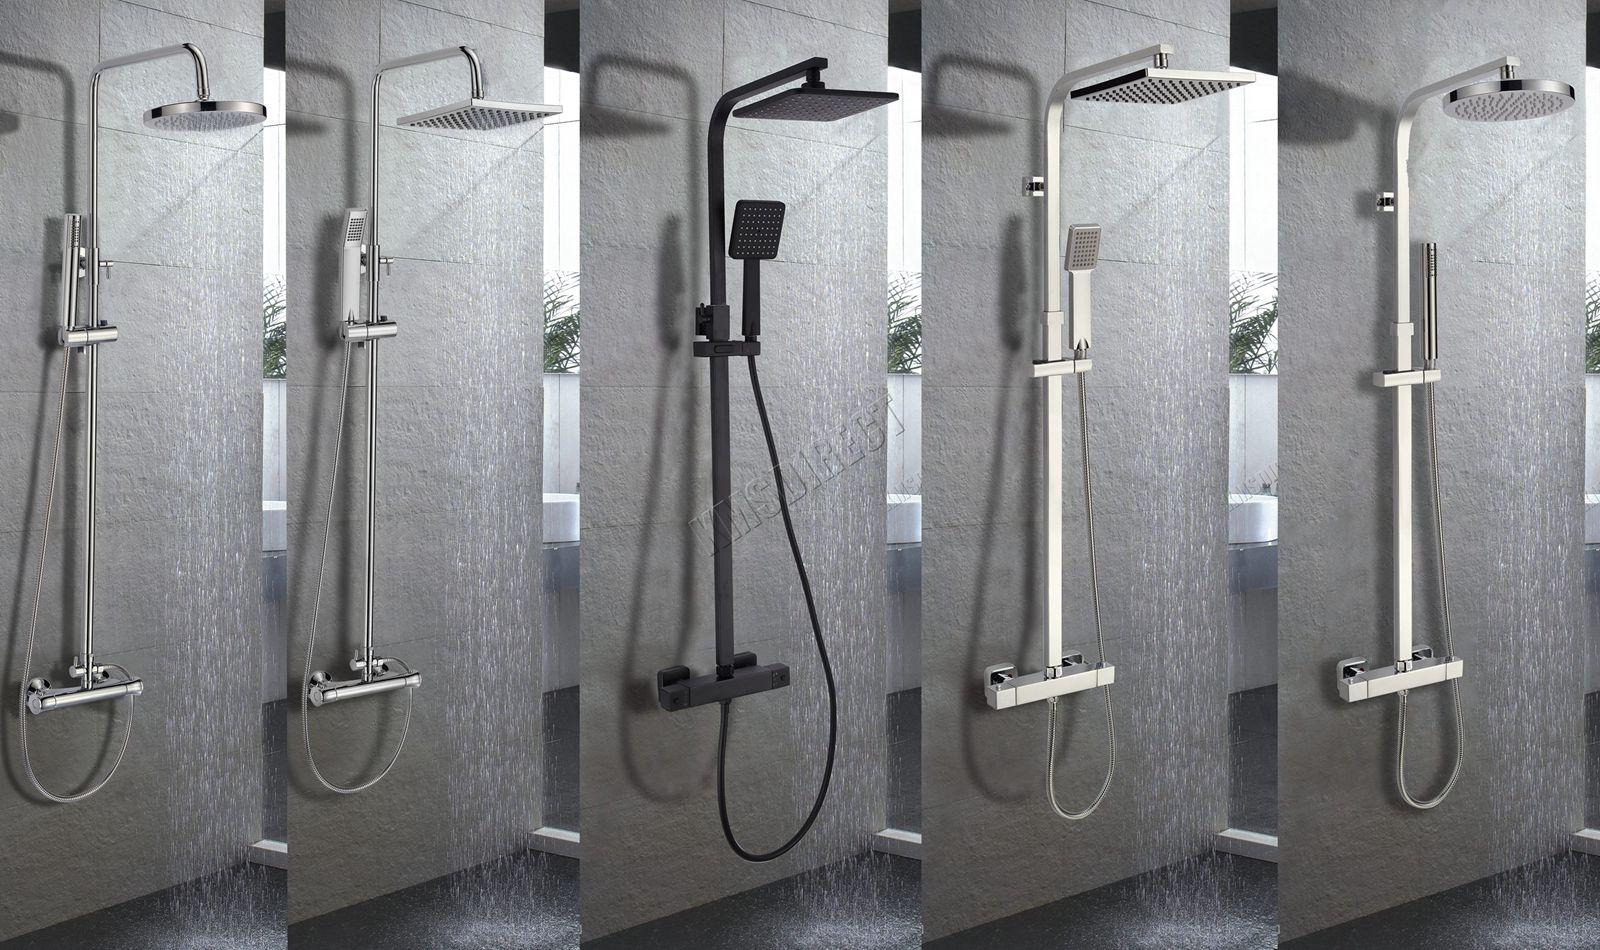 Sentinel Foxhunter Bathroom Mixer Shower Set Twin Head Round Square Chrome Thermostatic